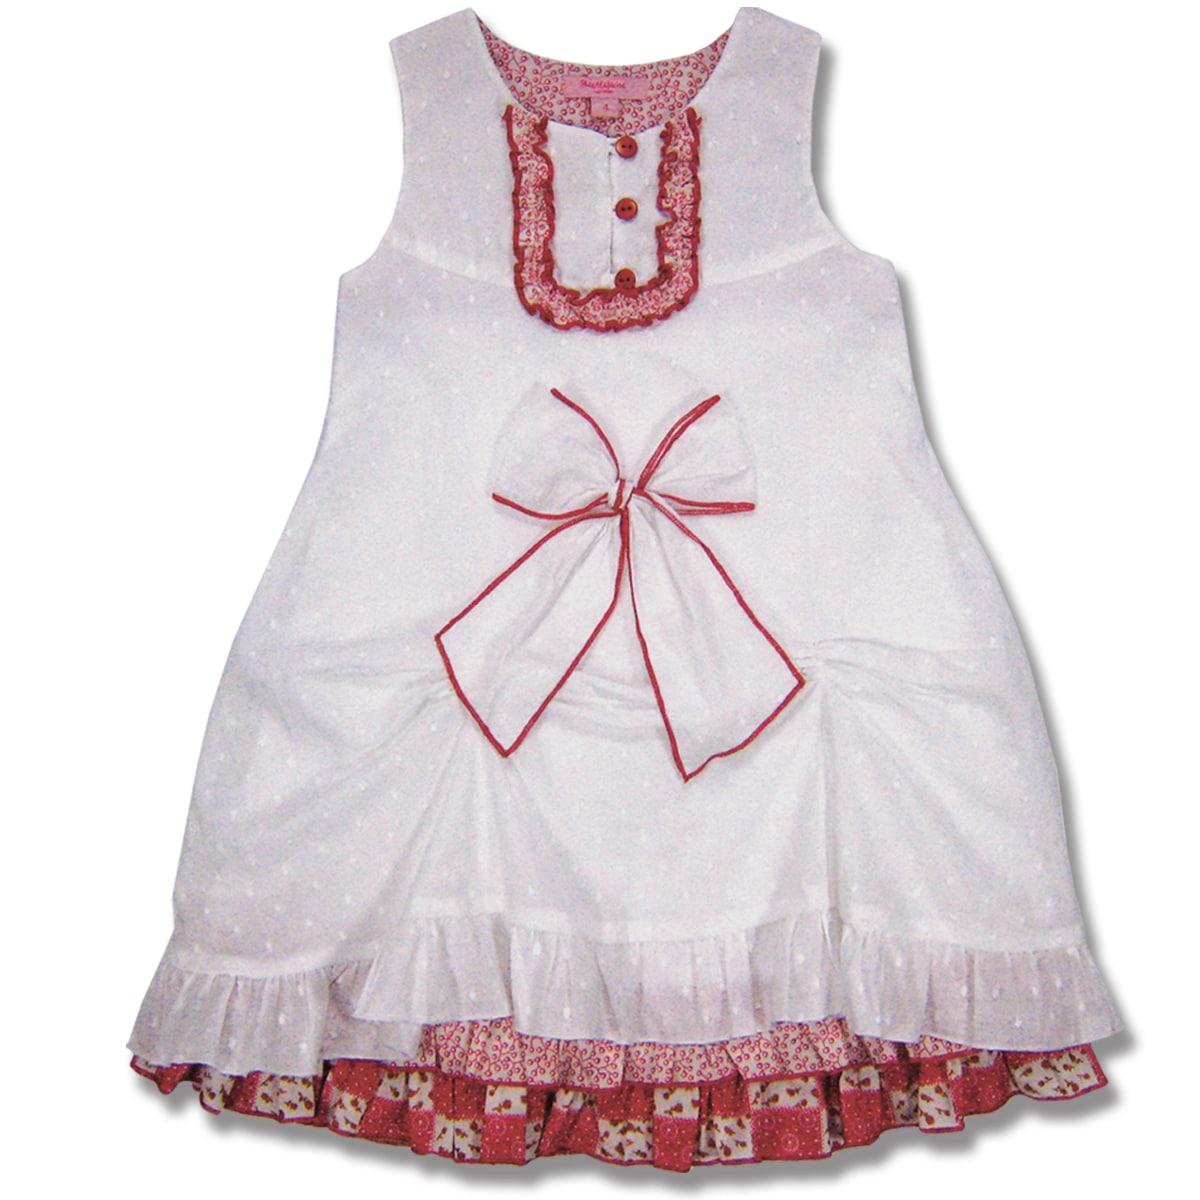 Beetlejuice London Girl's Swiss Dot Dress